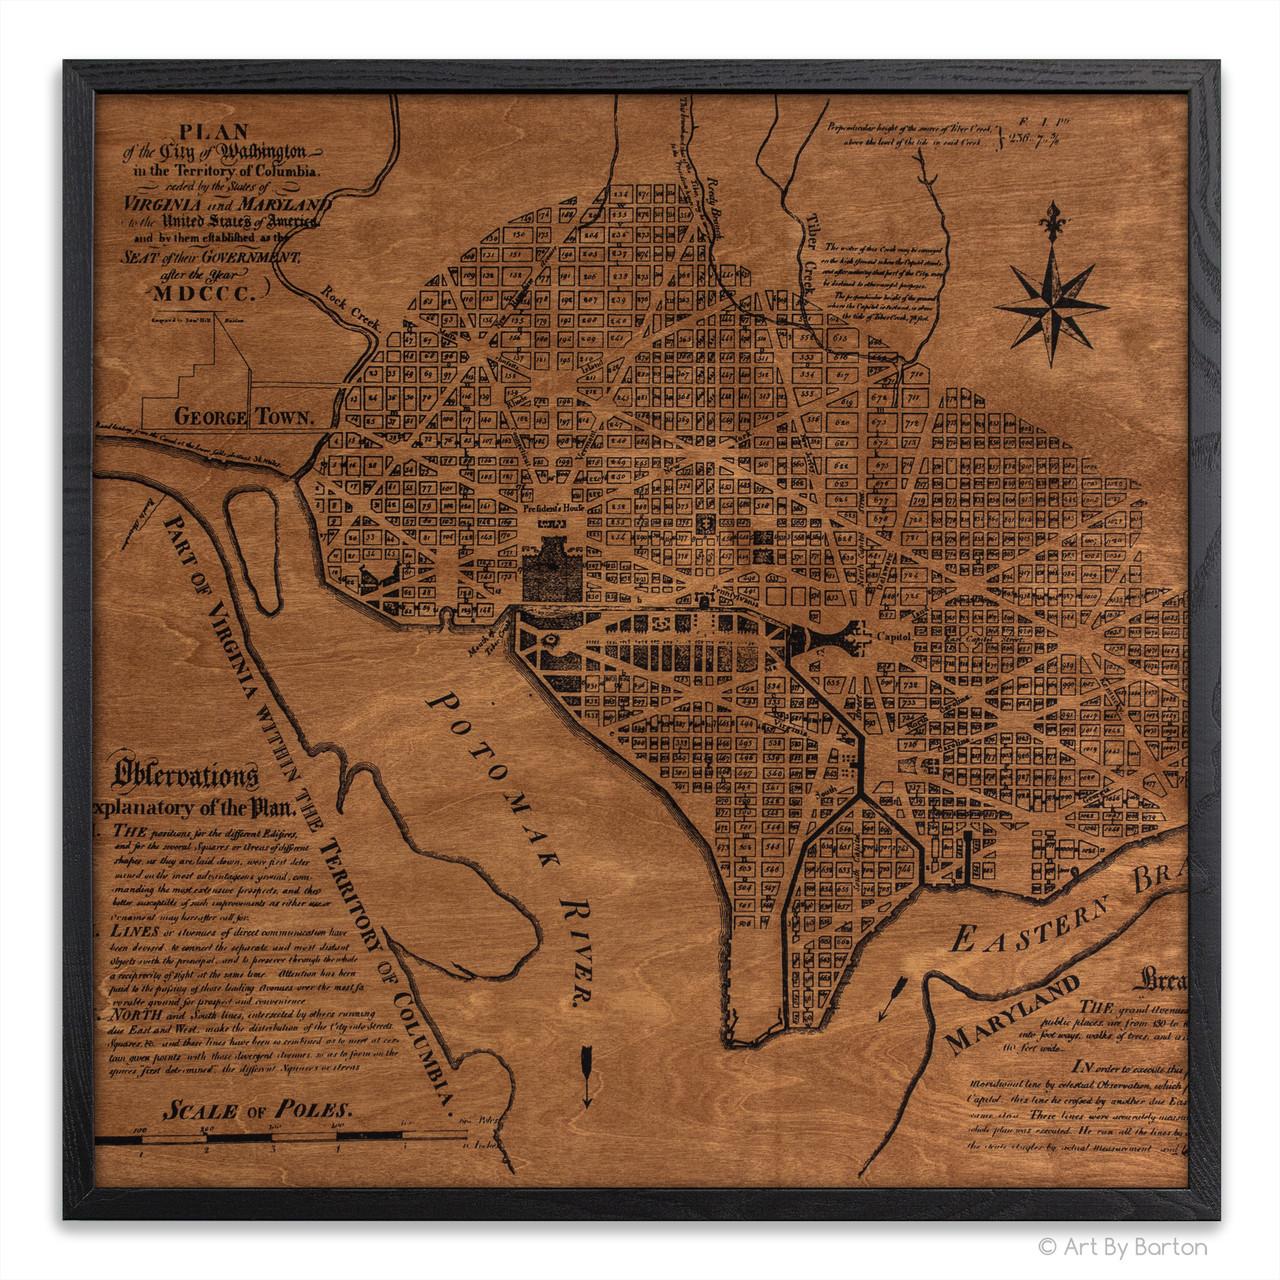 Washington D. C. Map on austin map art, toronto map art, south dakota map art, sf map art, wv map art, idaho map art, tennessee map art, massachusetts map art, arkansas map art, virginia map art, colorado map art, new jersey map art, nebraska map art, az map art, wisconsin map art, baltimore map art, atlanta map art, mississippi map art, la map art, sc map art,